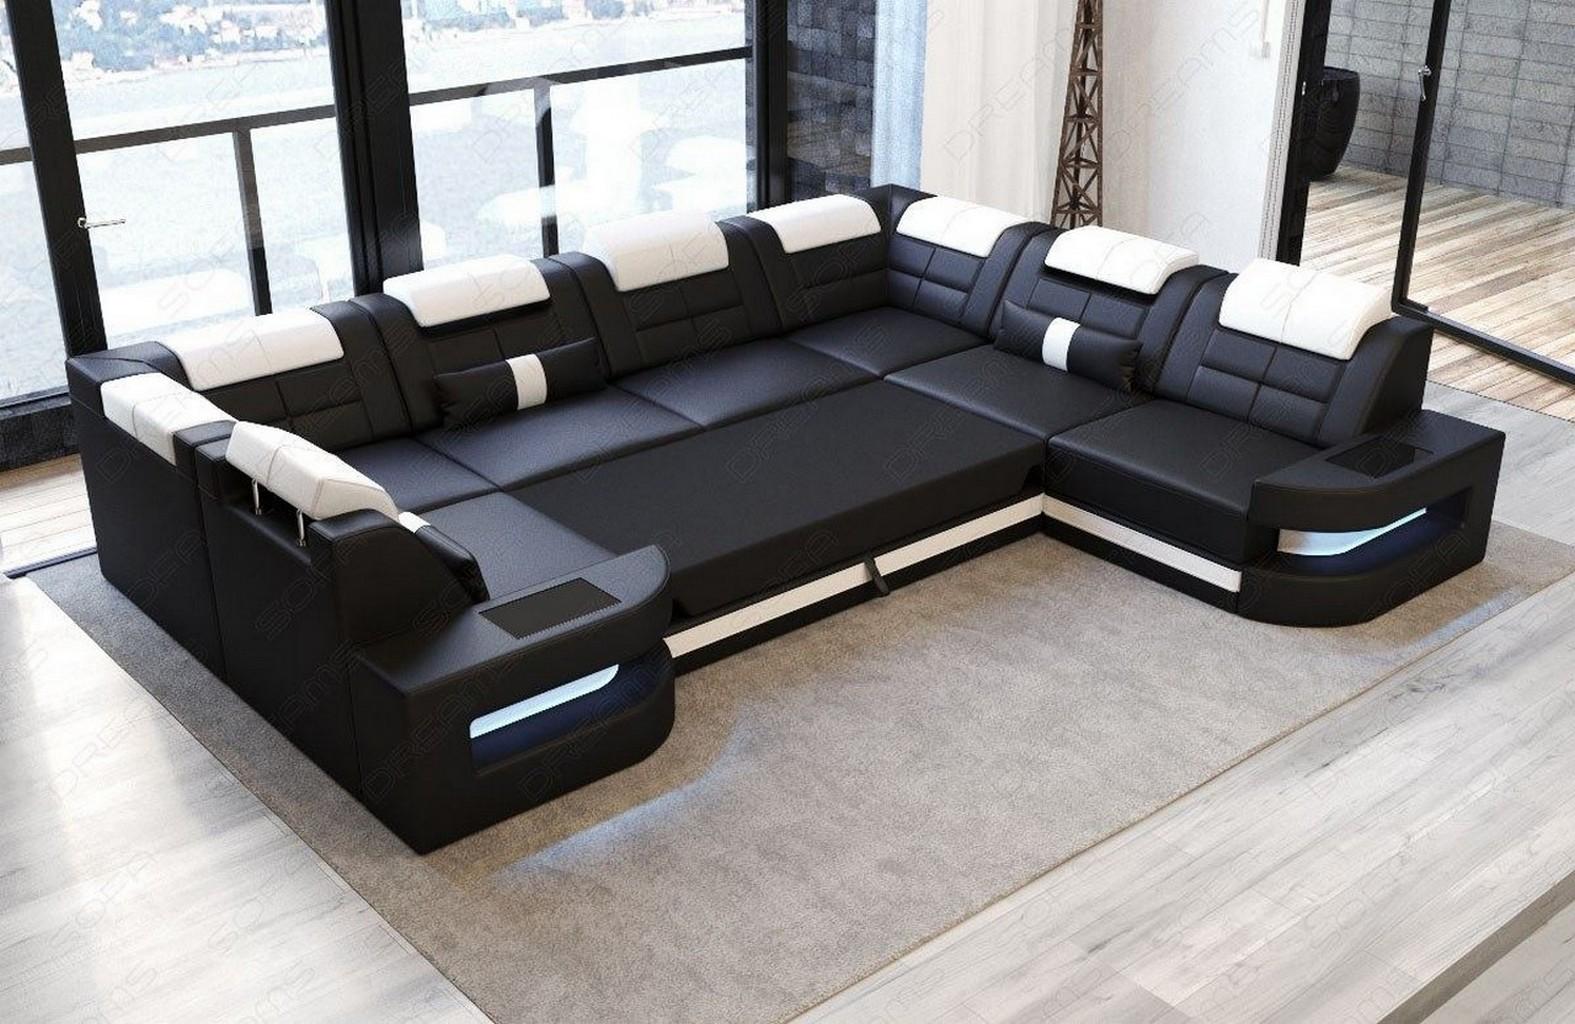 leder couch ecksofa wohnlandschaft como u led ottomane kopfst tzen verstellbar ebay. Black Bedroom Furniture Sets. Home Design Ideas